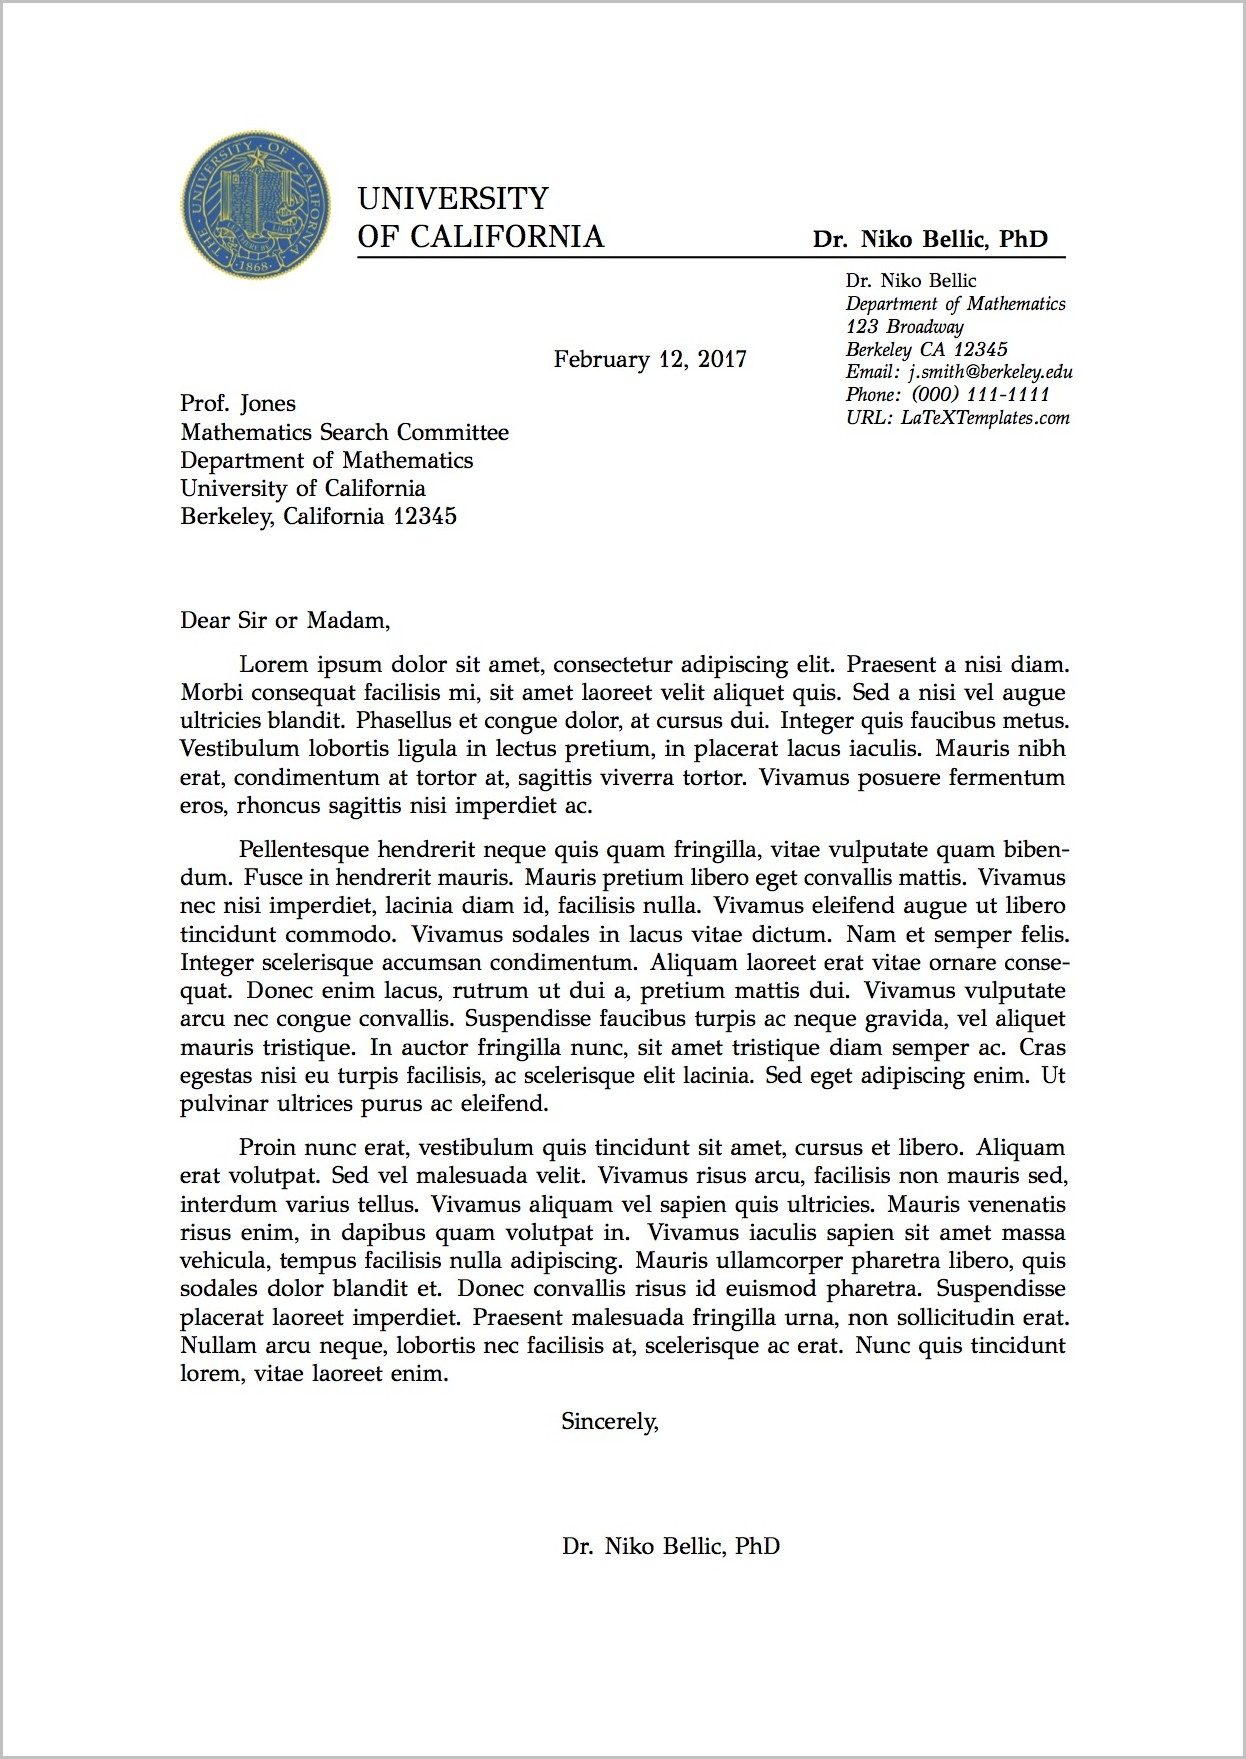 Email Cover Letter For Resume Sample Pdf